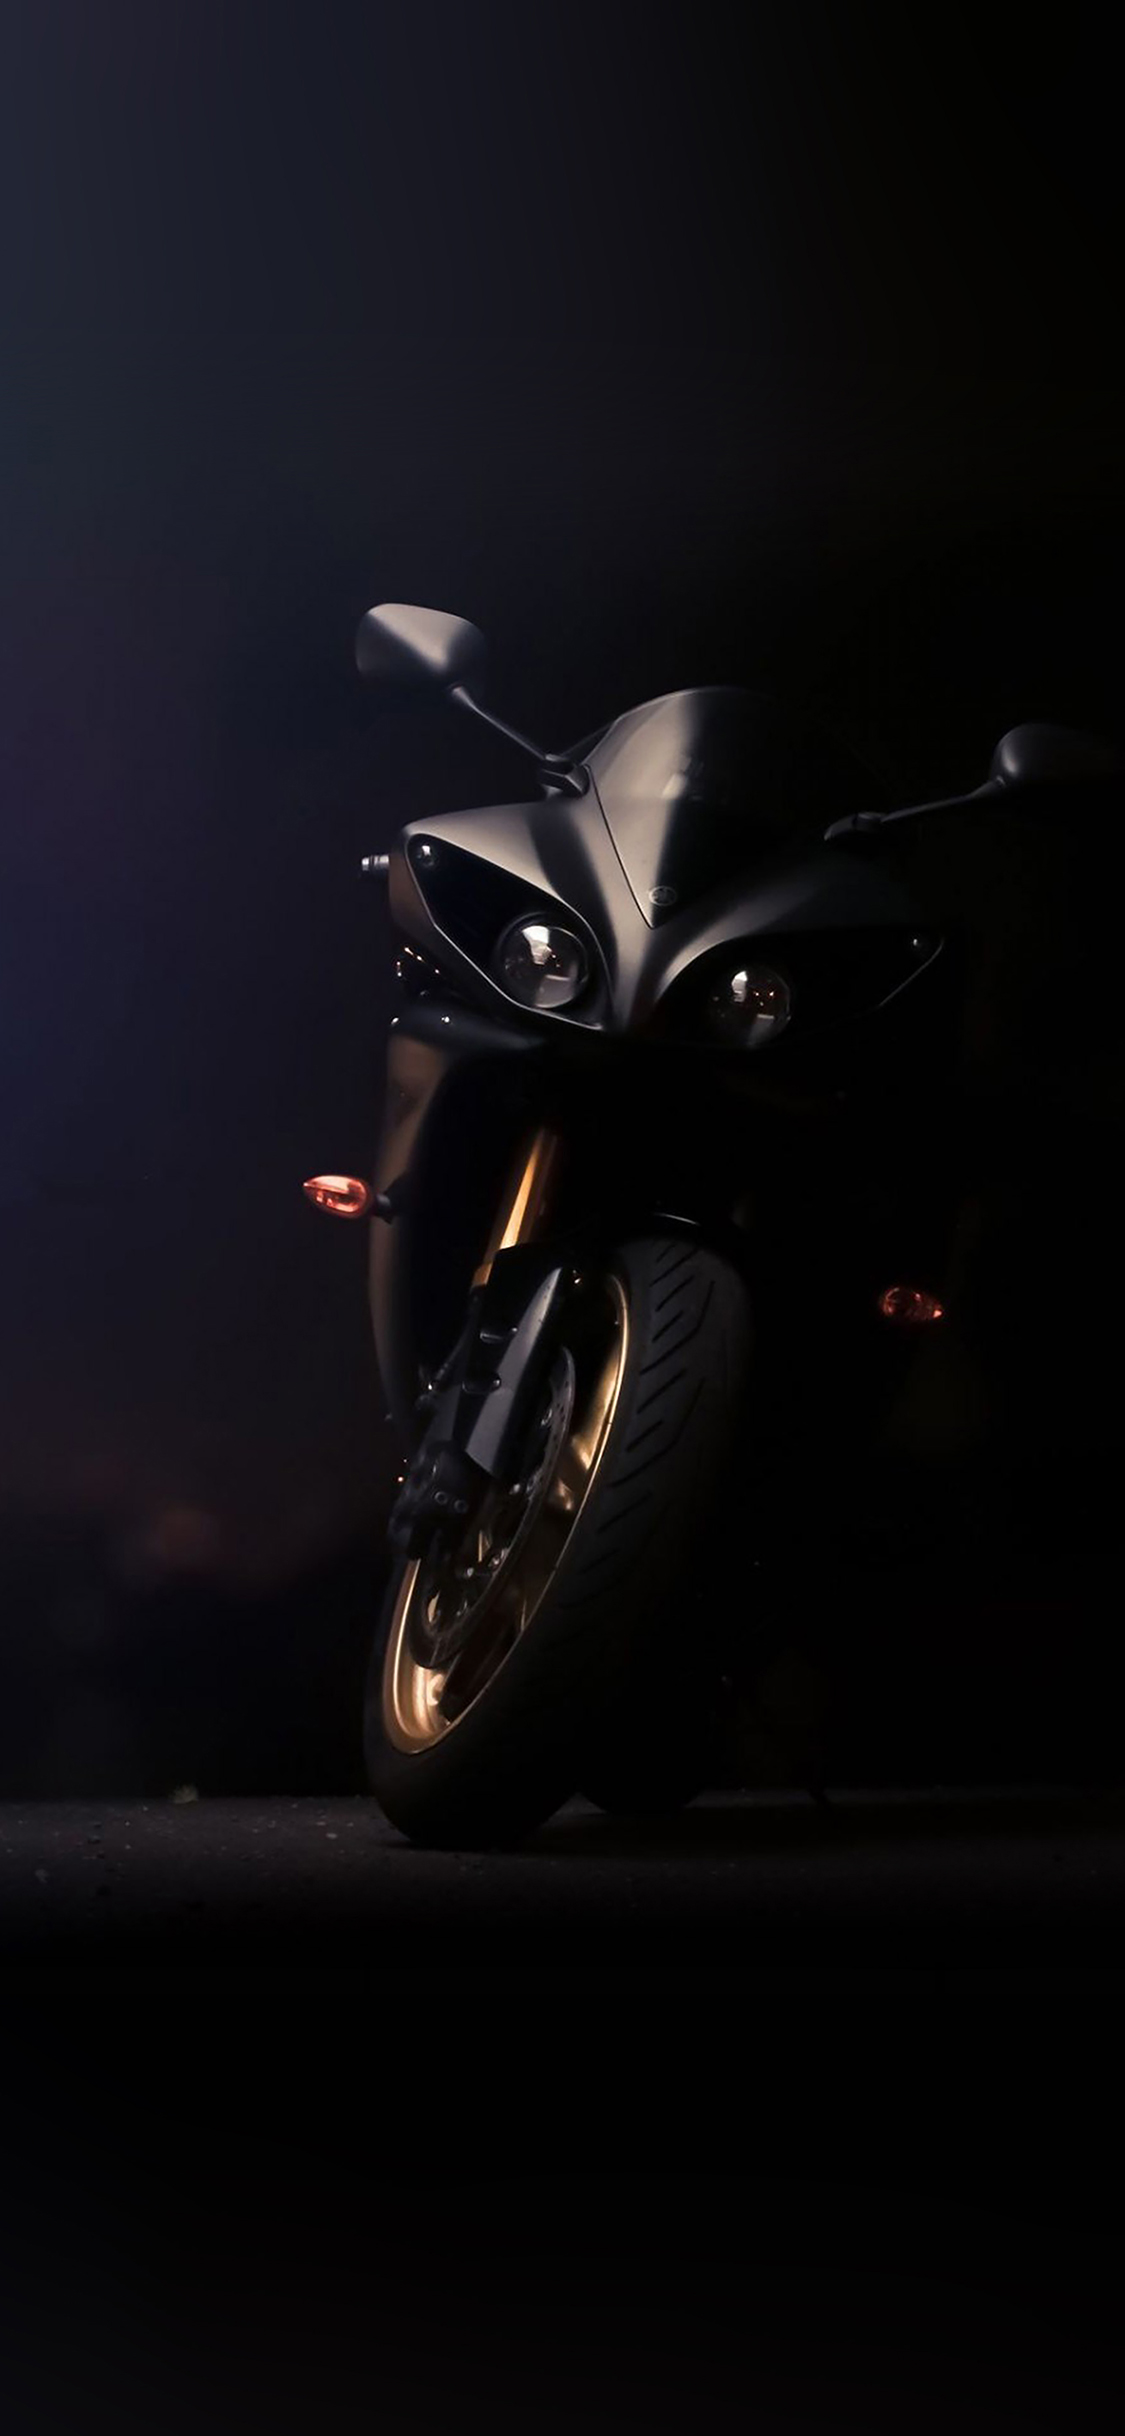 1080p Wallpapers Car Af47 Yamaha Ride Motorbike Wallpaper